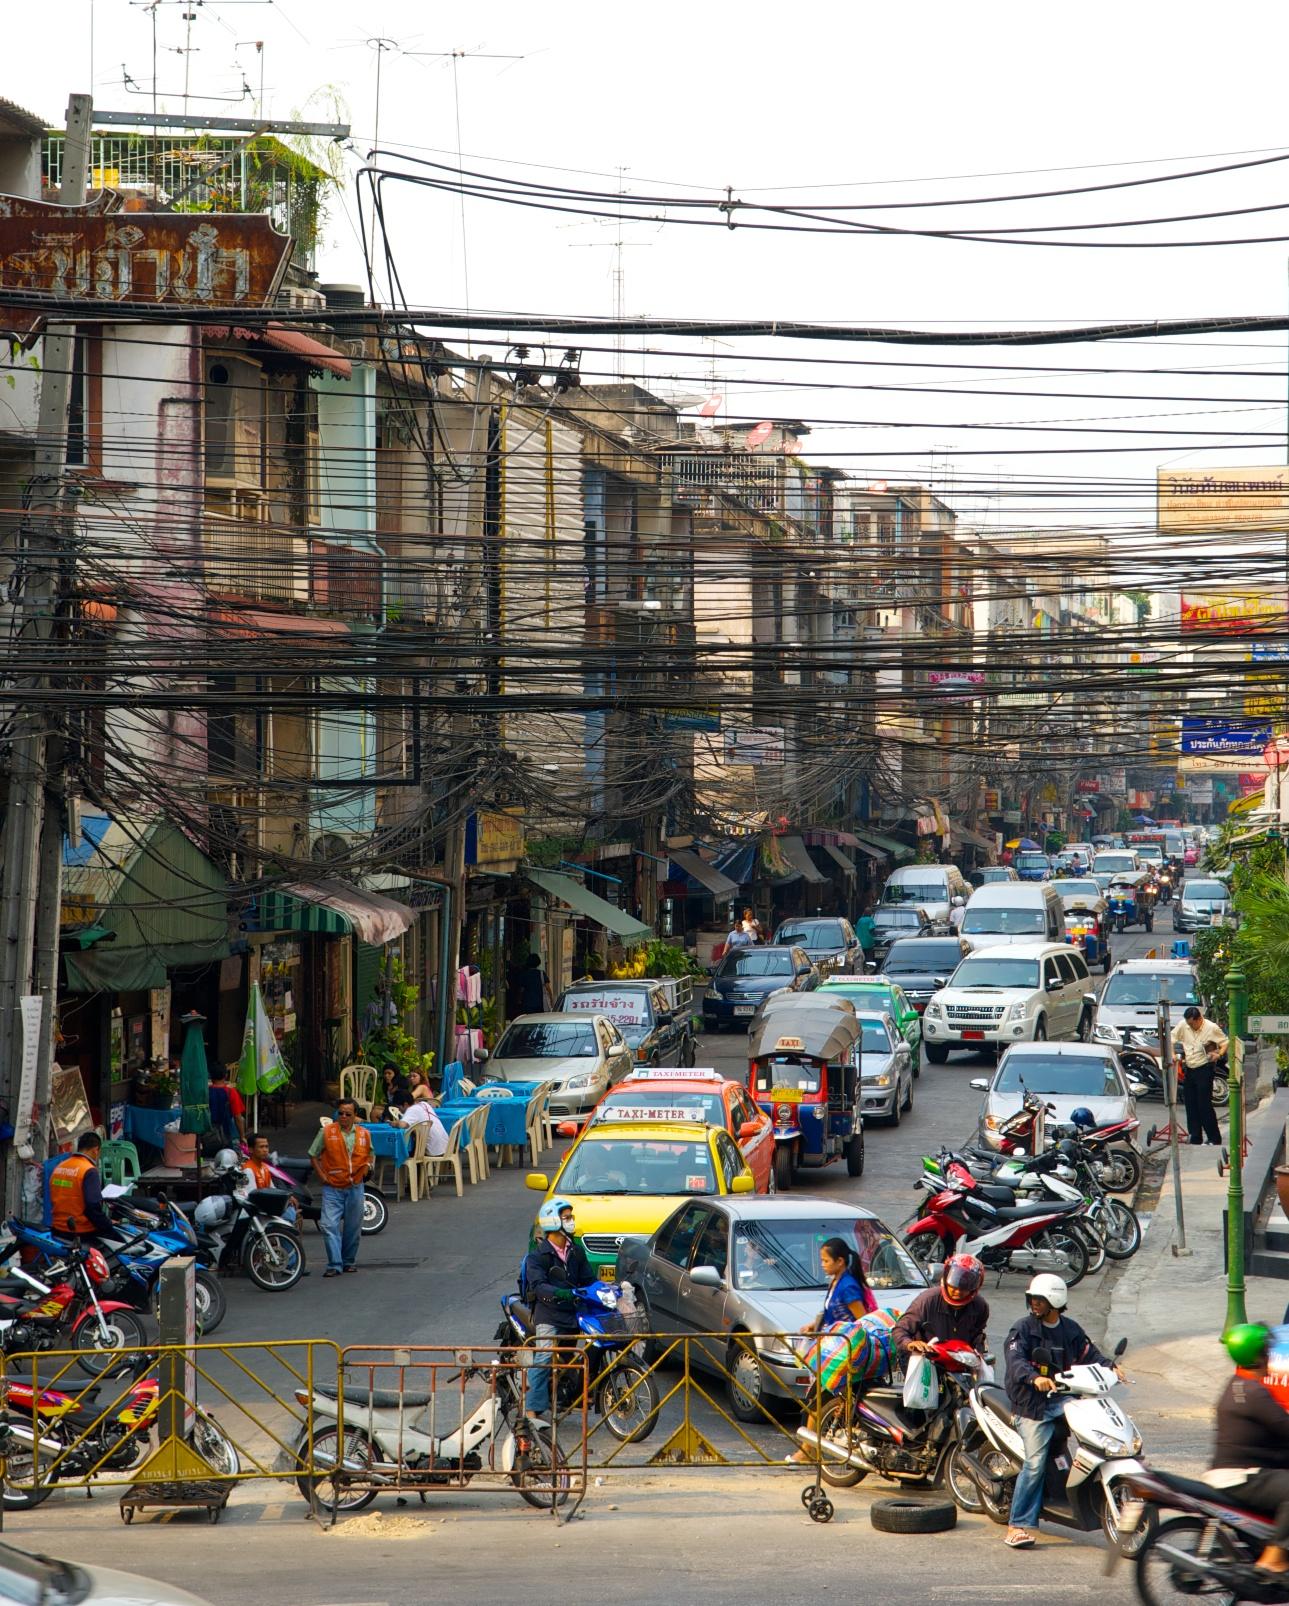 Аренда авто в Тайланде, аэропорту Бангкока, цены на прокат автомобиля в Тайланде